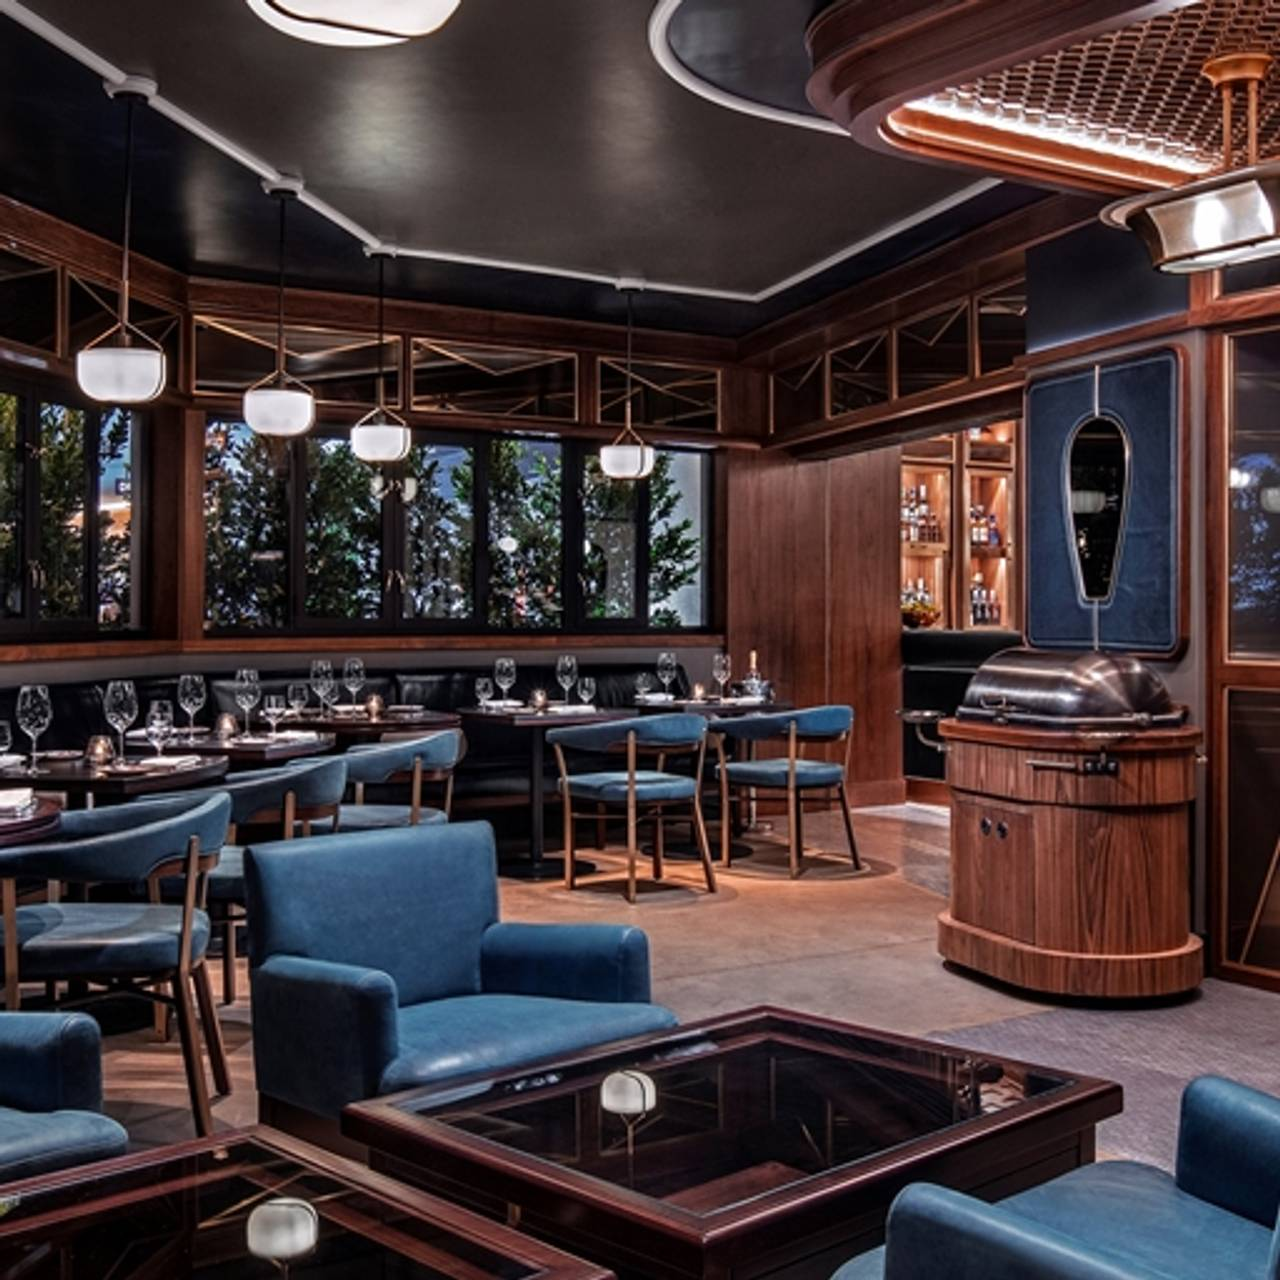 Palms casino restaurants